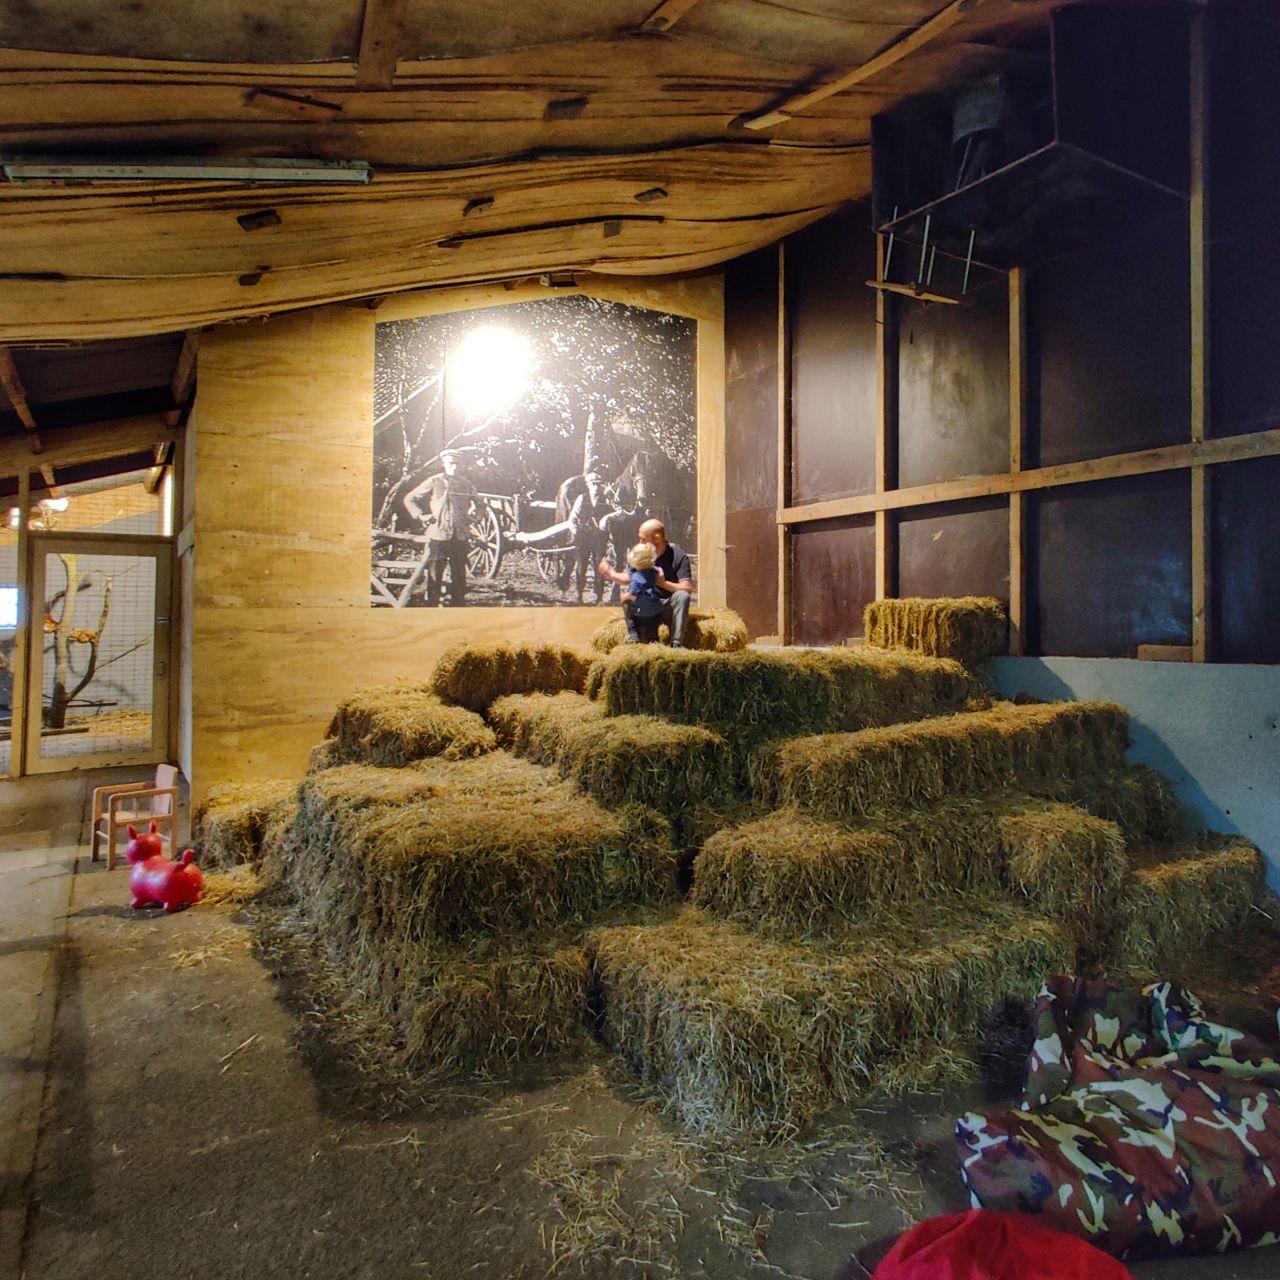 De Kleine Wildenberg Deventer hooi bioscoop